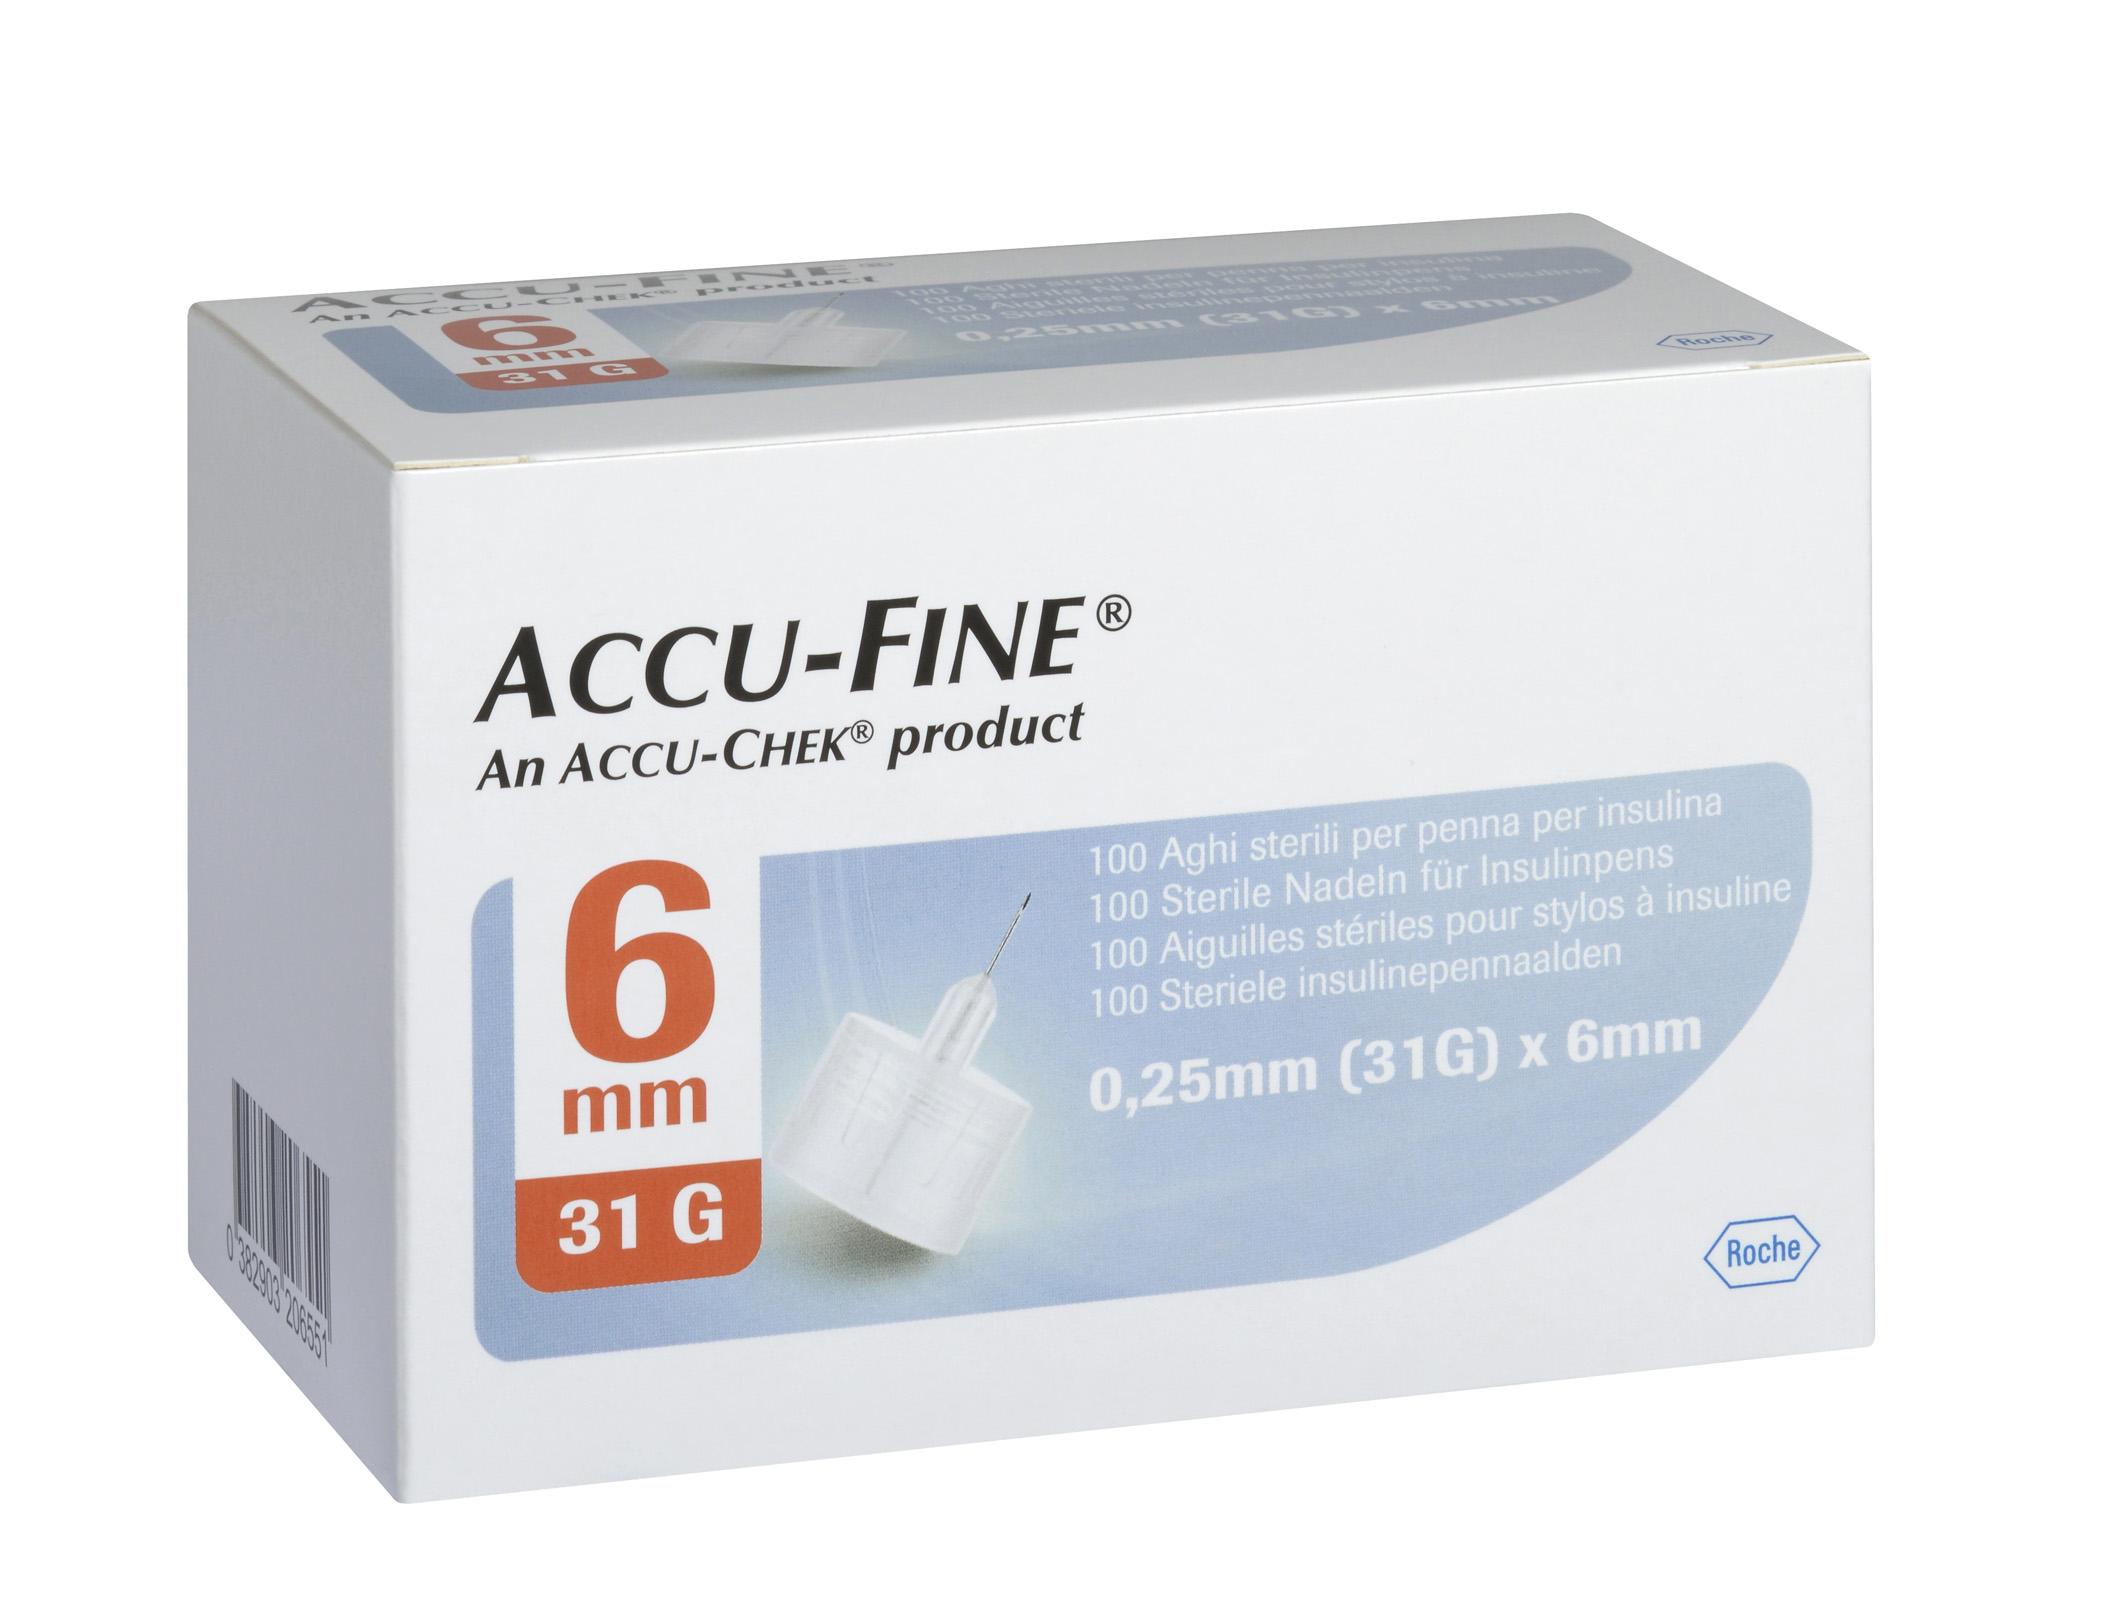 accu-fine (31g) 6mmm